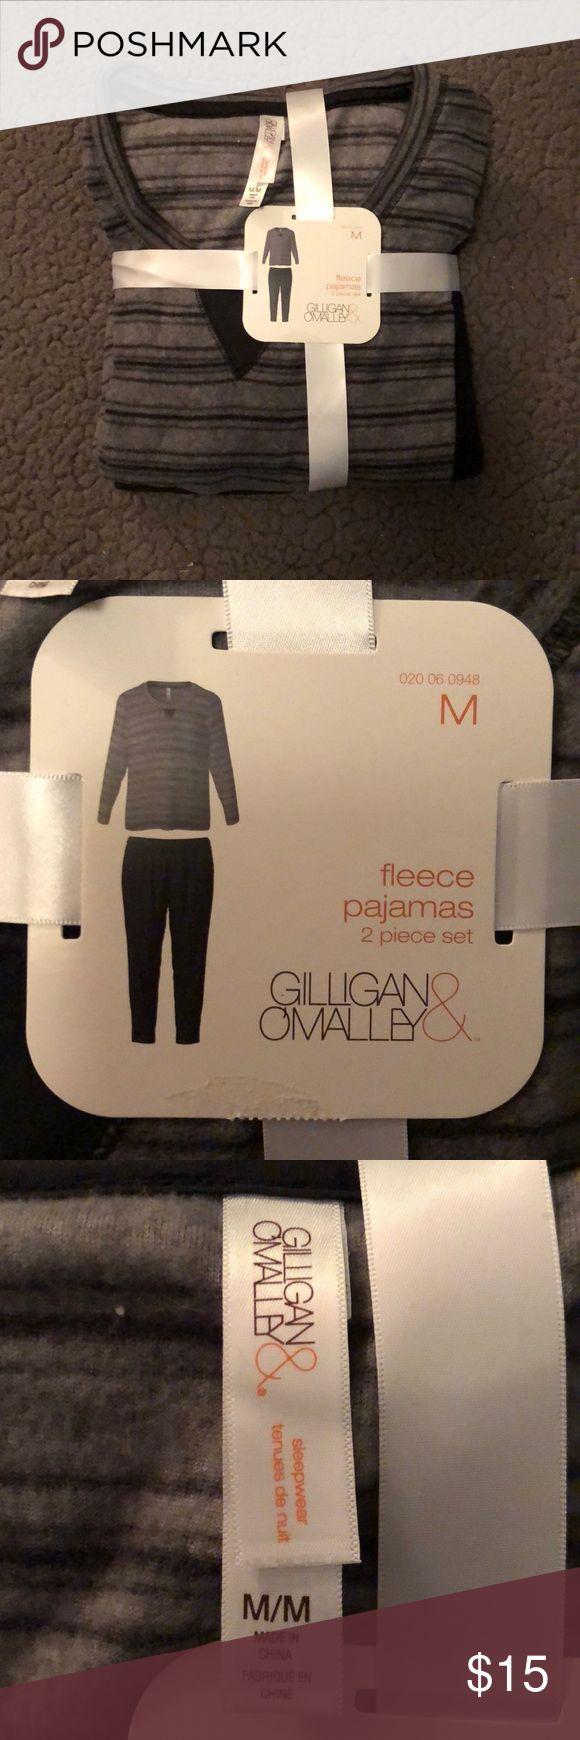 Gillian & O'Malley fleece pajamas set Size medium black fleece pajama pants and grey with black stripes fleece pajama top! They come as a set! Never worn, tags still attached! Super soft!! Gilligan & O'Malley Intimates & Sleepwear Pajamas